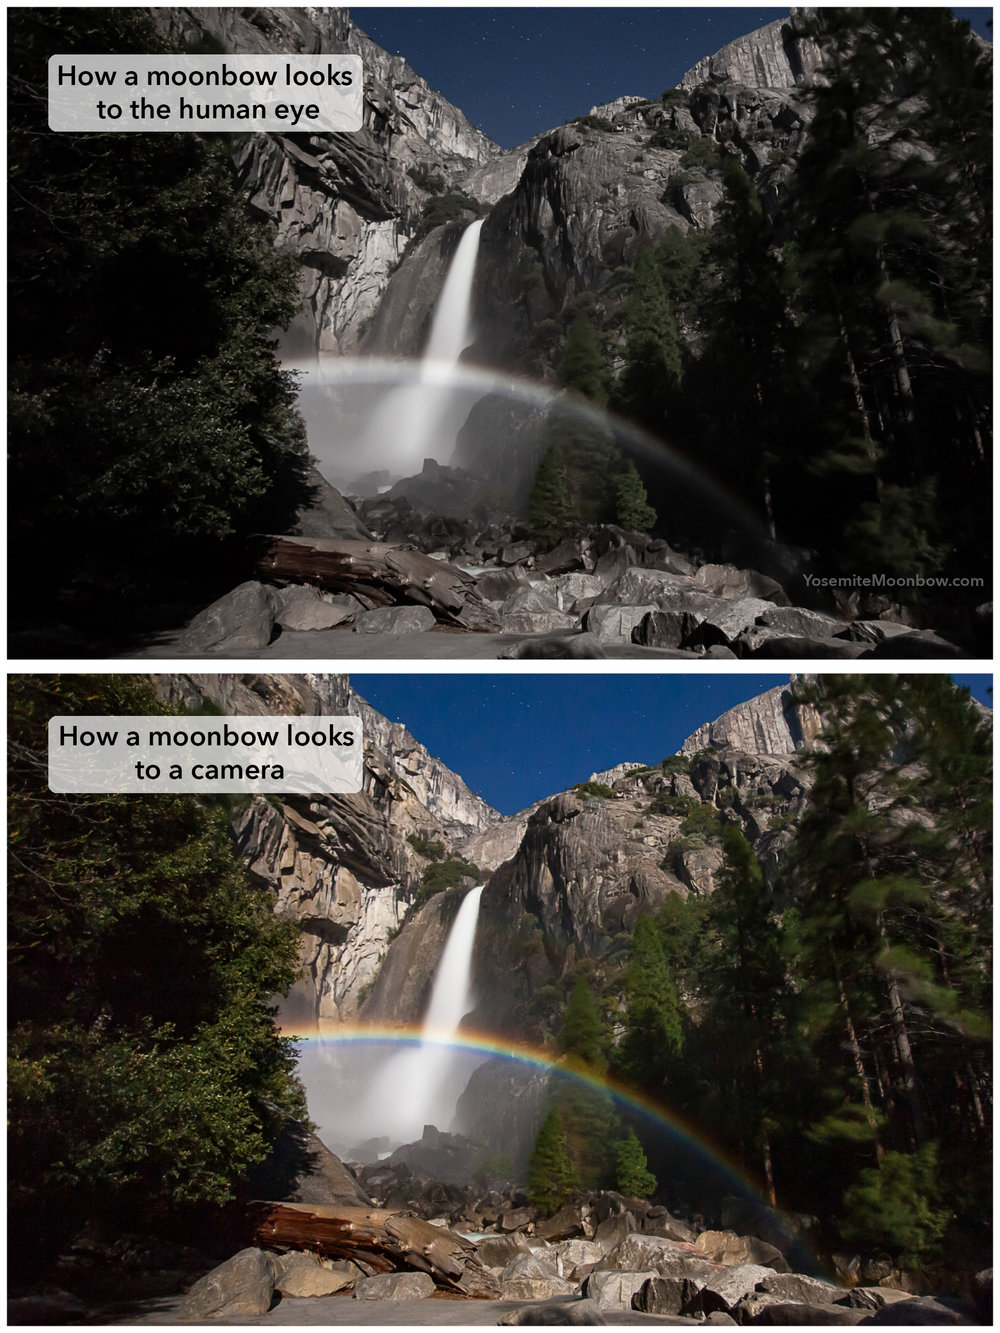 moonbow camera versus human eye comparison.jpg